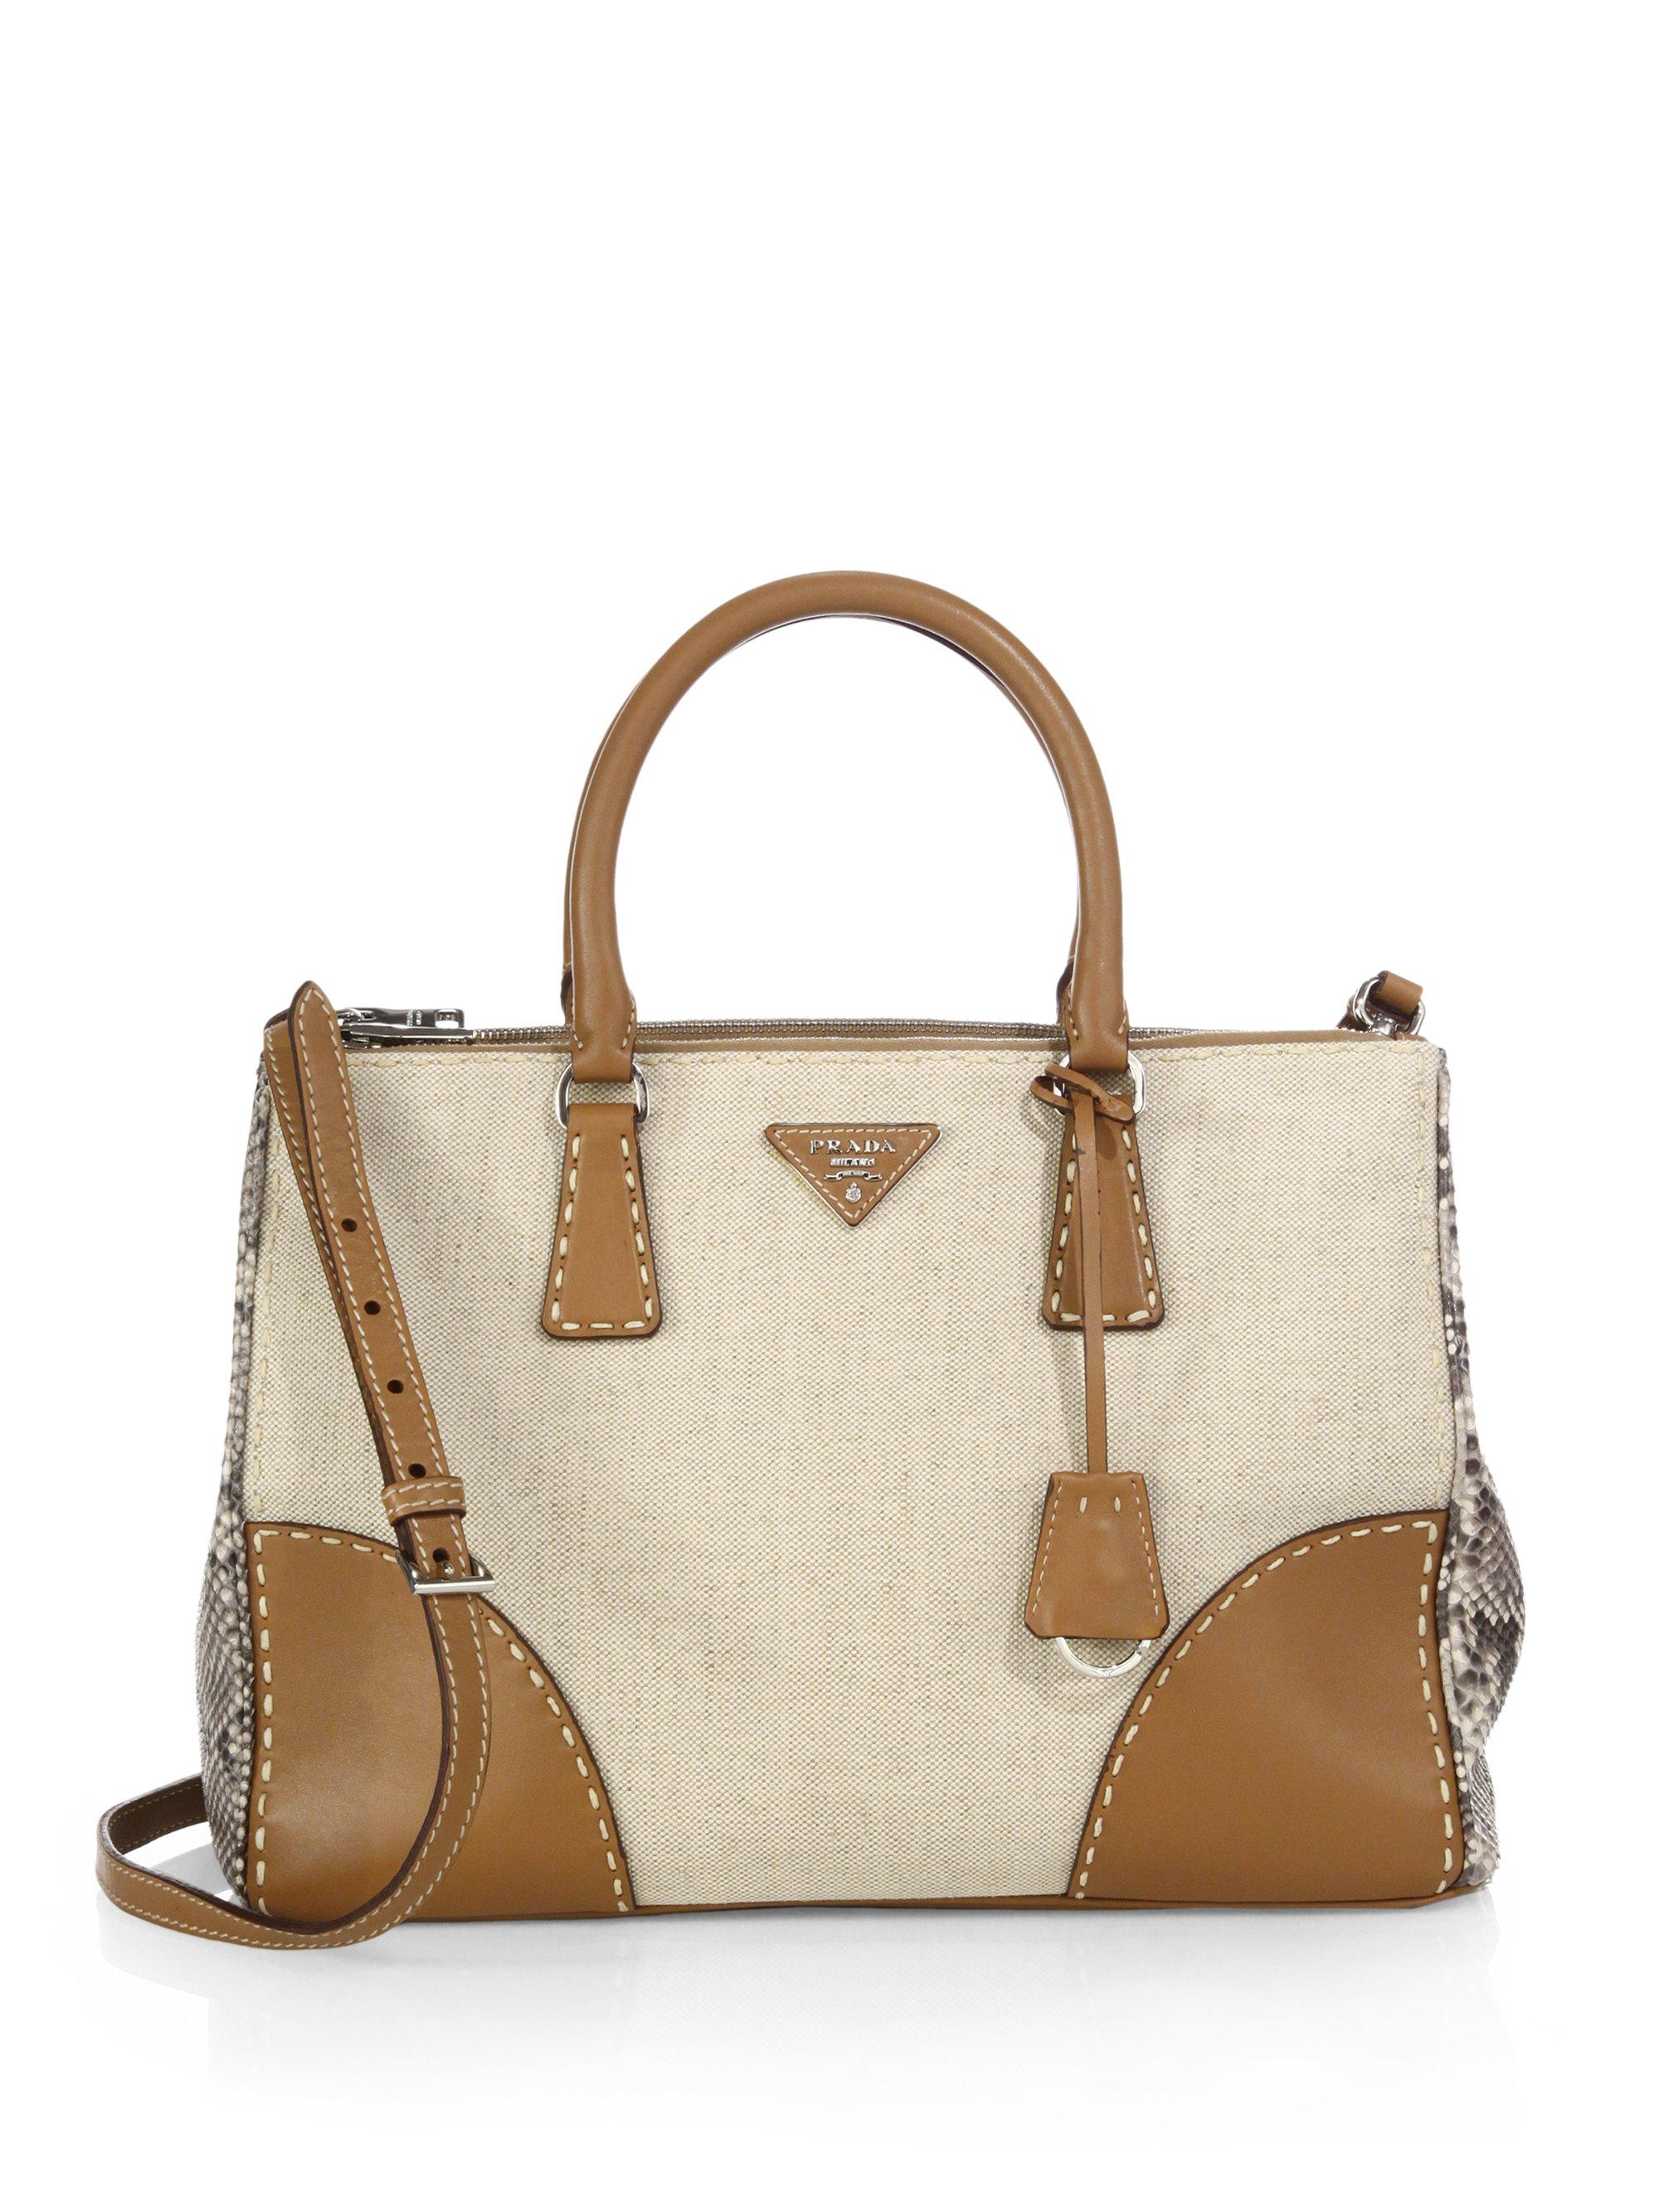 11d685ab7ca28c coupon code for replica prada handbags 80db9 0b856; wholesale lyst prada  canvas python double bag in brown 66fc2 ff23f